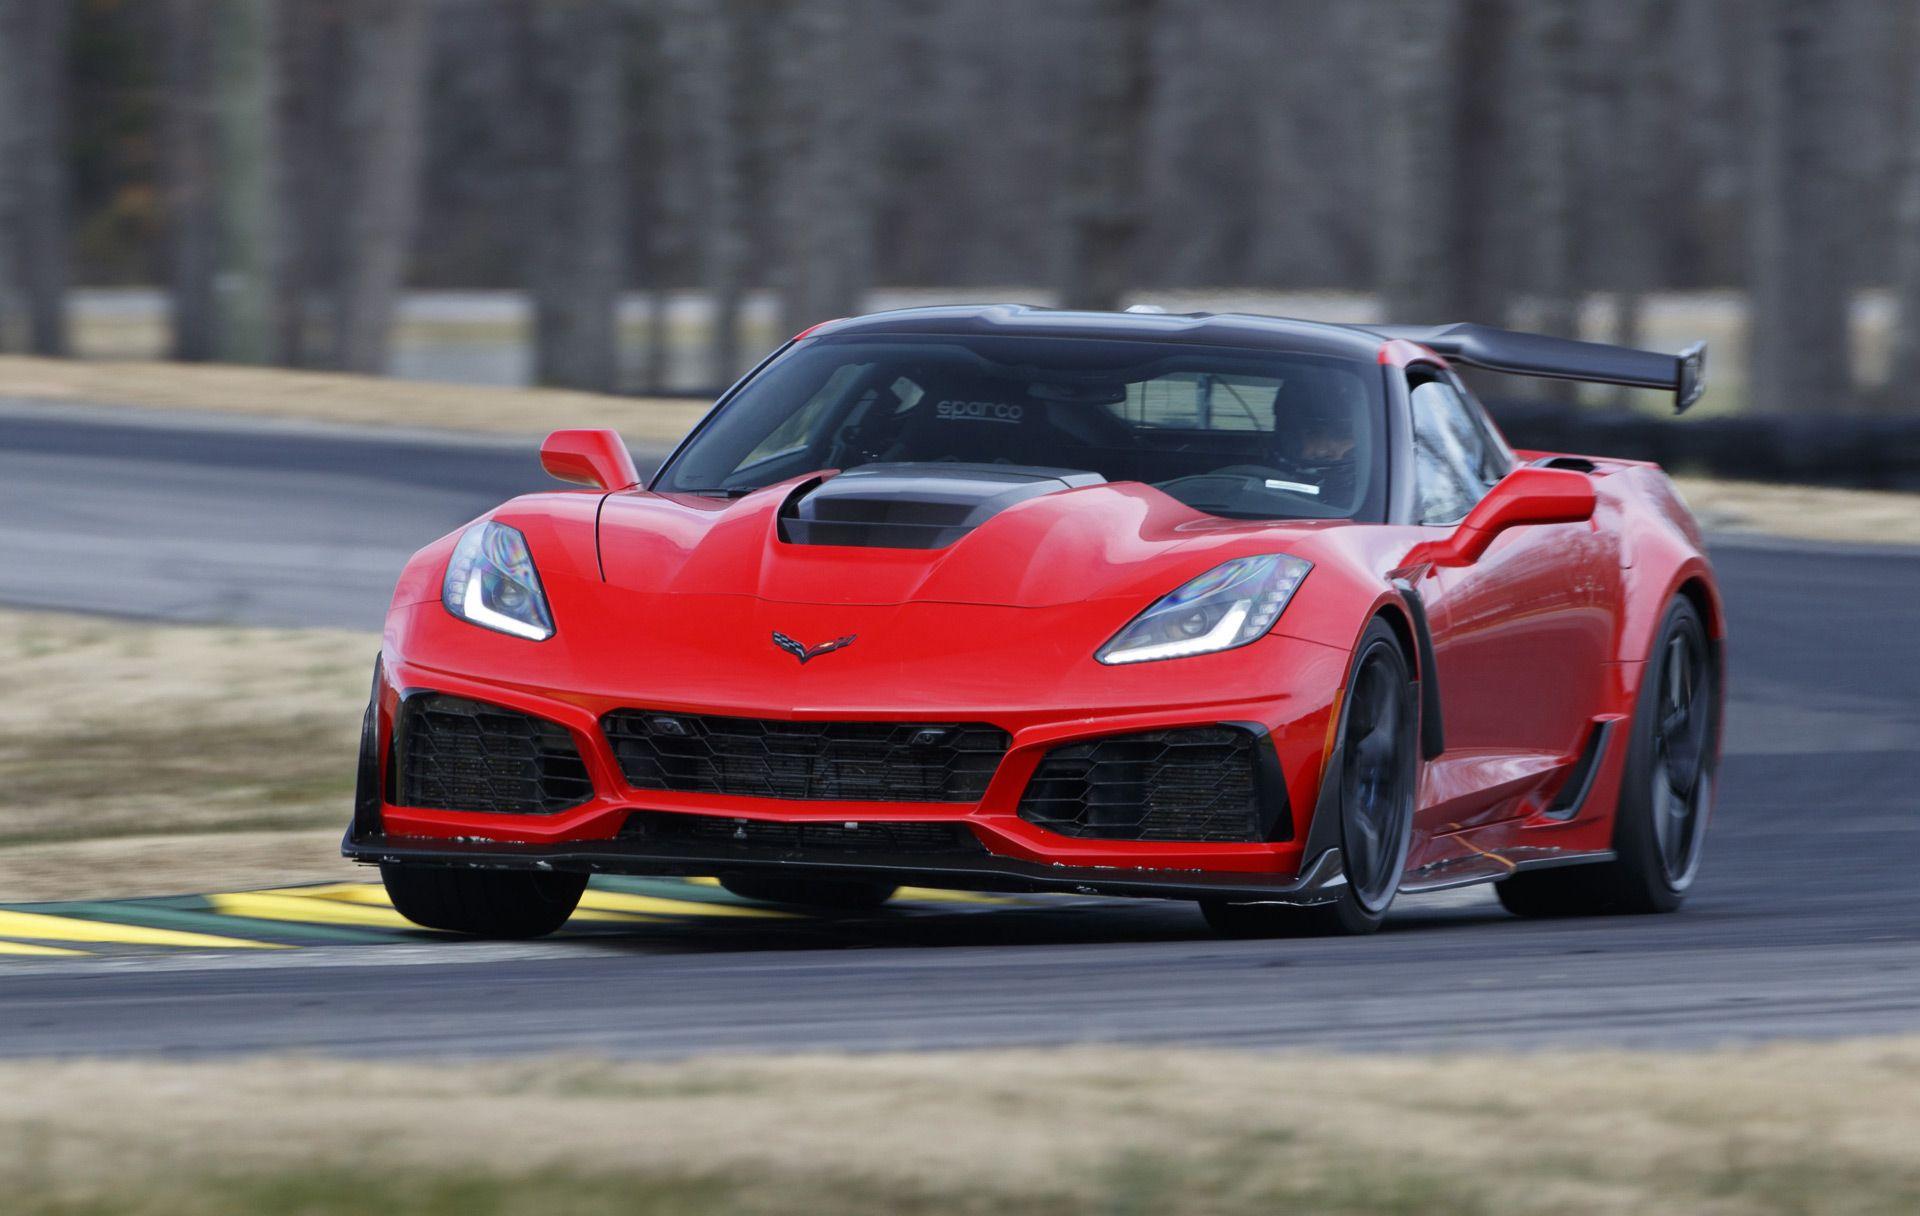 2019 Corvette ZR1 specs confirmed, including 060 mph time